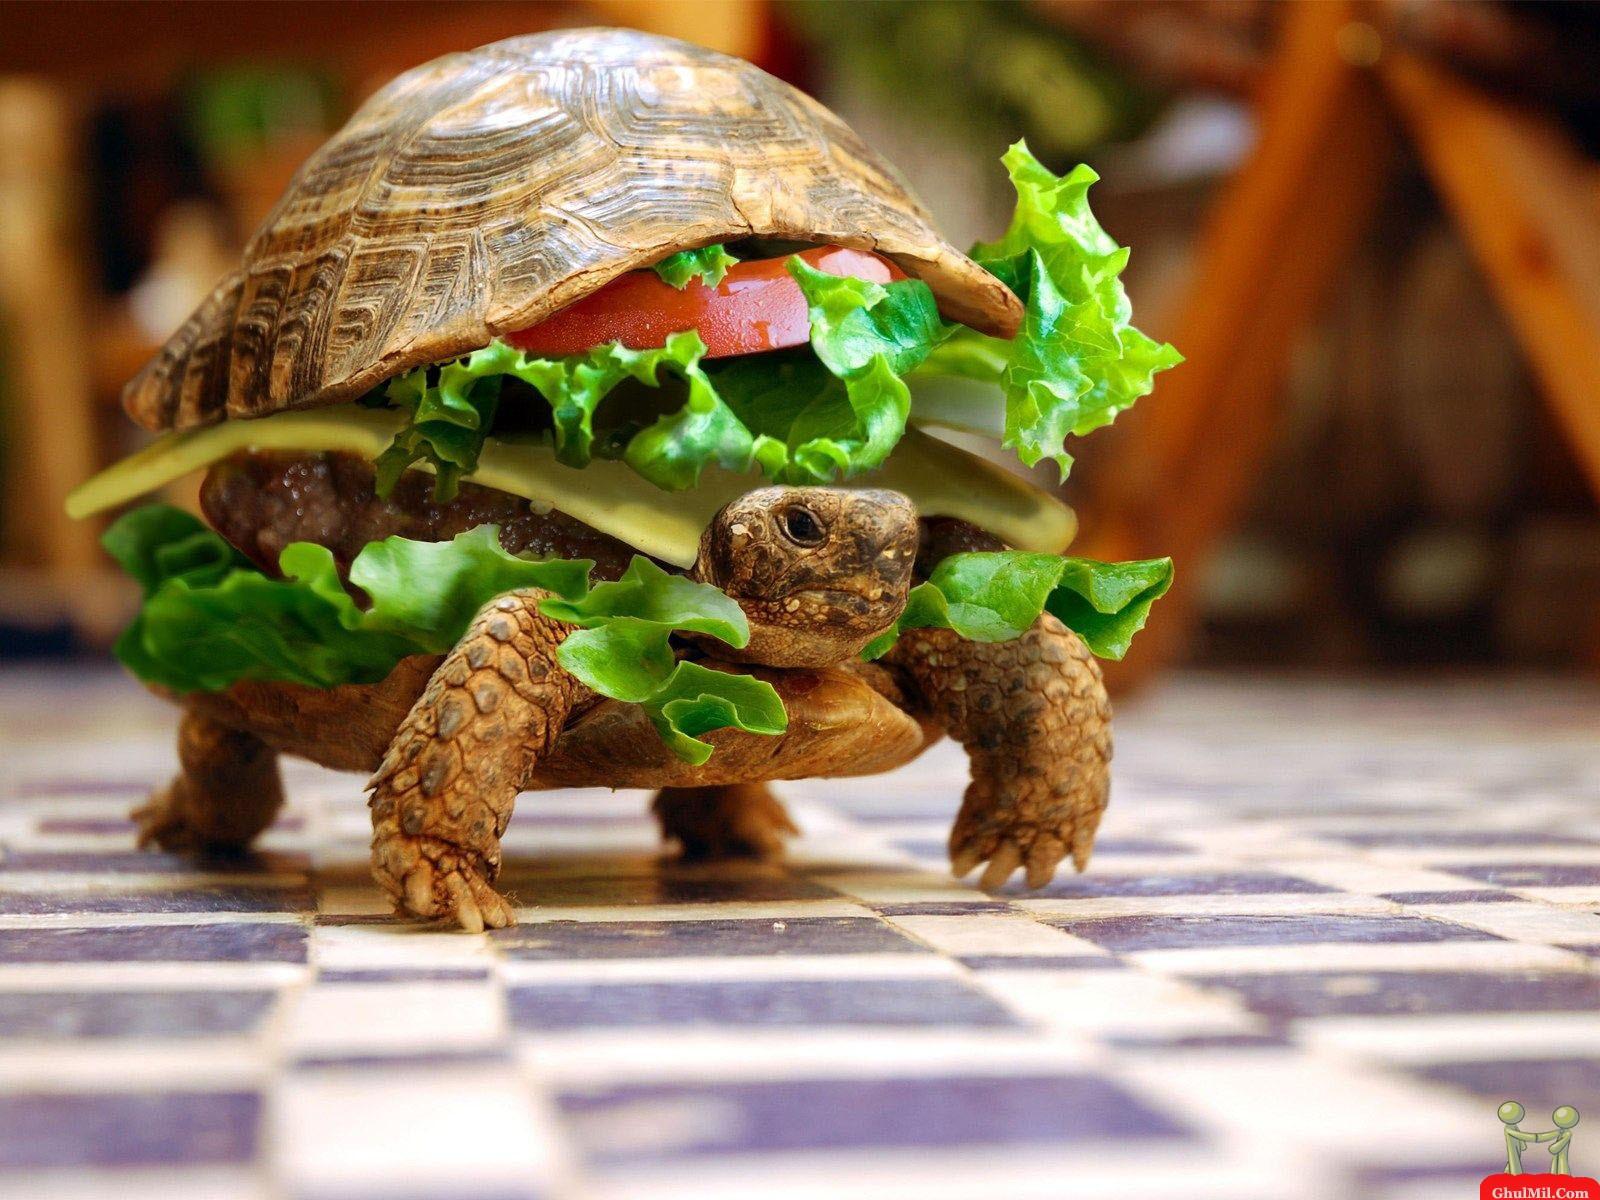 http://3.bp.blogspot.com/-MppC21AR3cs/Td1VR7cB6MI/AAAAAAAAAd8/S1sEYh9gLEk/s1600/fresh-live-turtle-burger-wallpaper.jpg